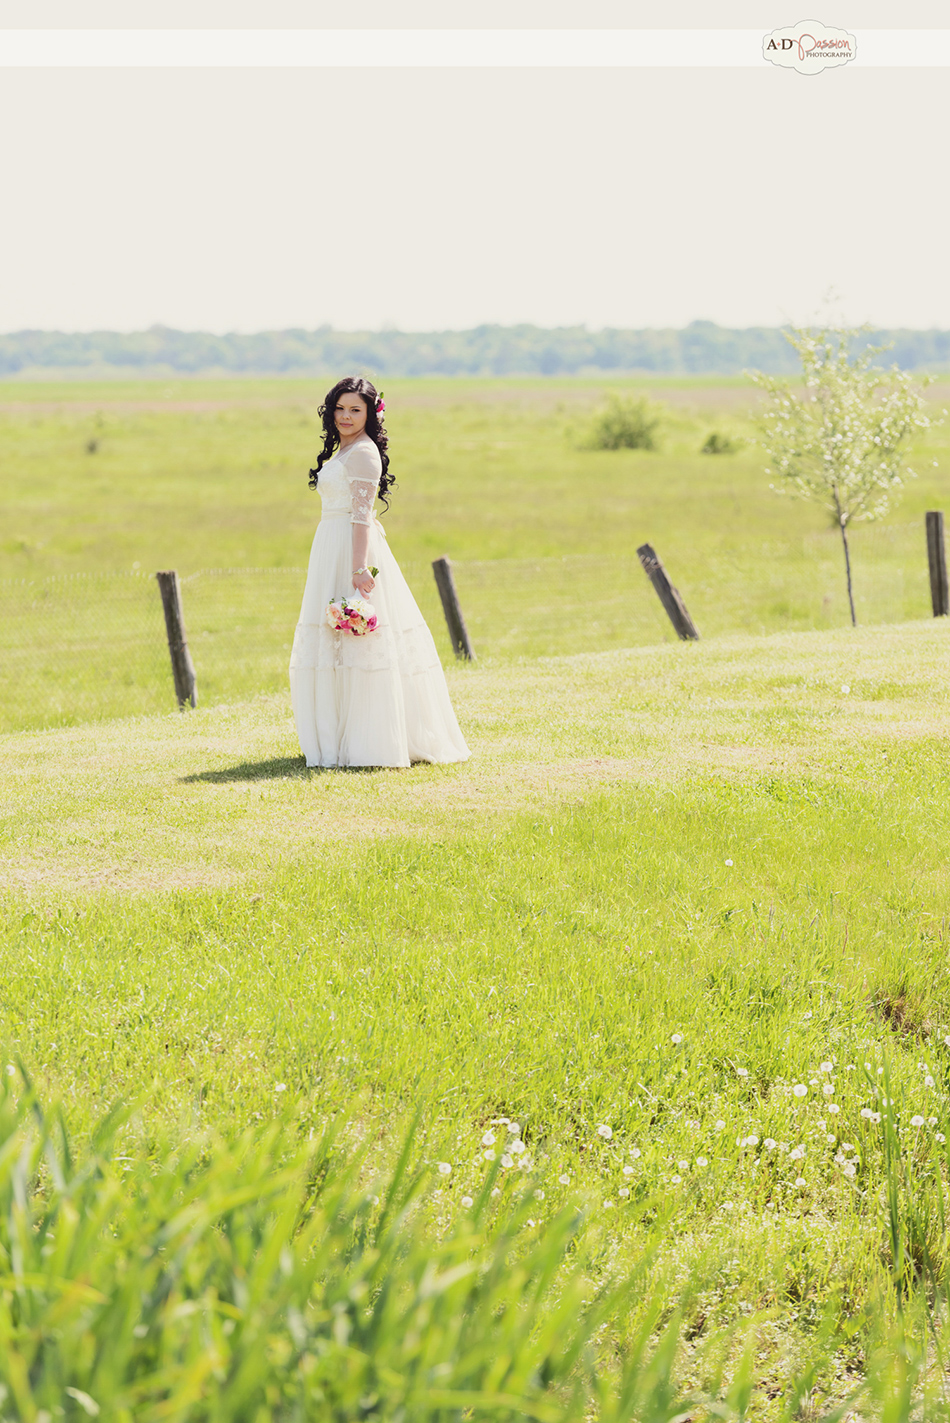 AD Passion Photography | 20140428_fotograf-nunta-timisoara_cristina_si_emanuel_0070 | Adelin, Dida, fotograf profesionist, fotograf de nunta, fotografie de nunta, fotograf Timisoara, fotograf Craiova, fotograf Bucuresti, fotograf Arad, nunta Timisoara, nunta Arad, nunta Bucuresti, nunta Craiova